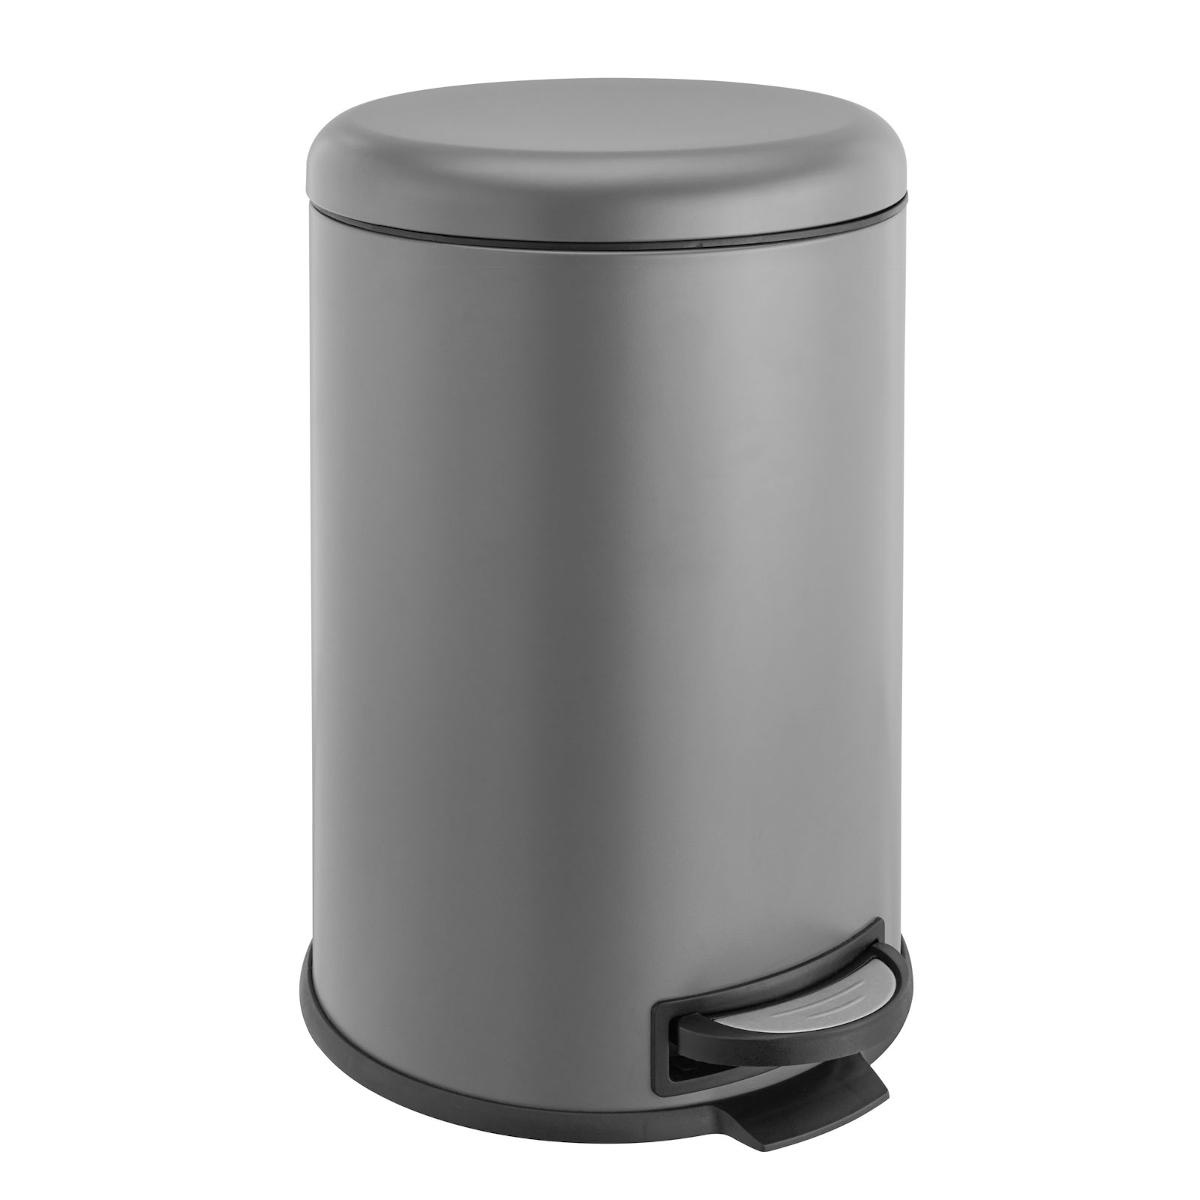 91898 SVITA T20 grau Mülleimer 20 Liter